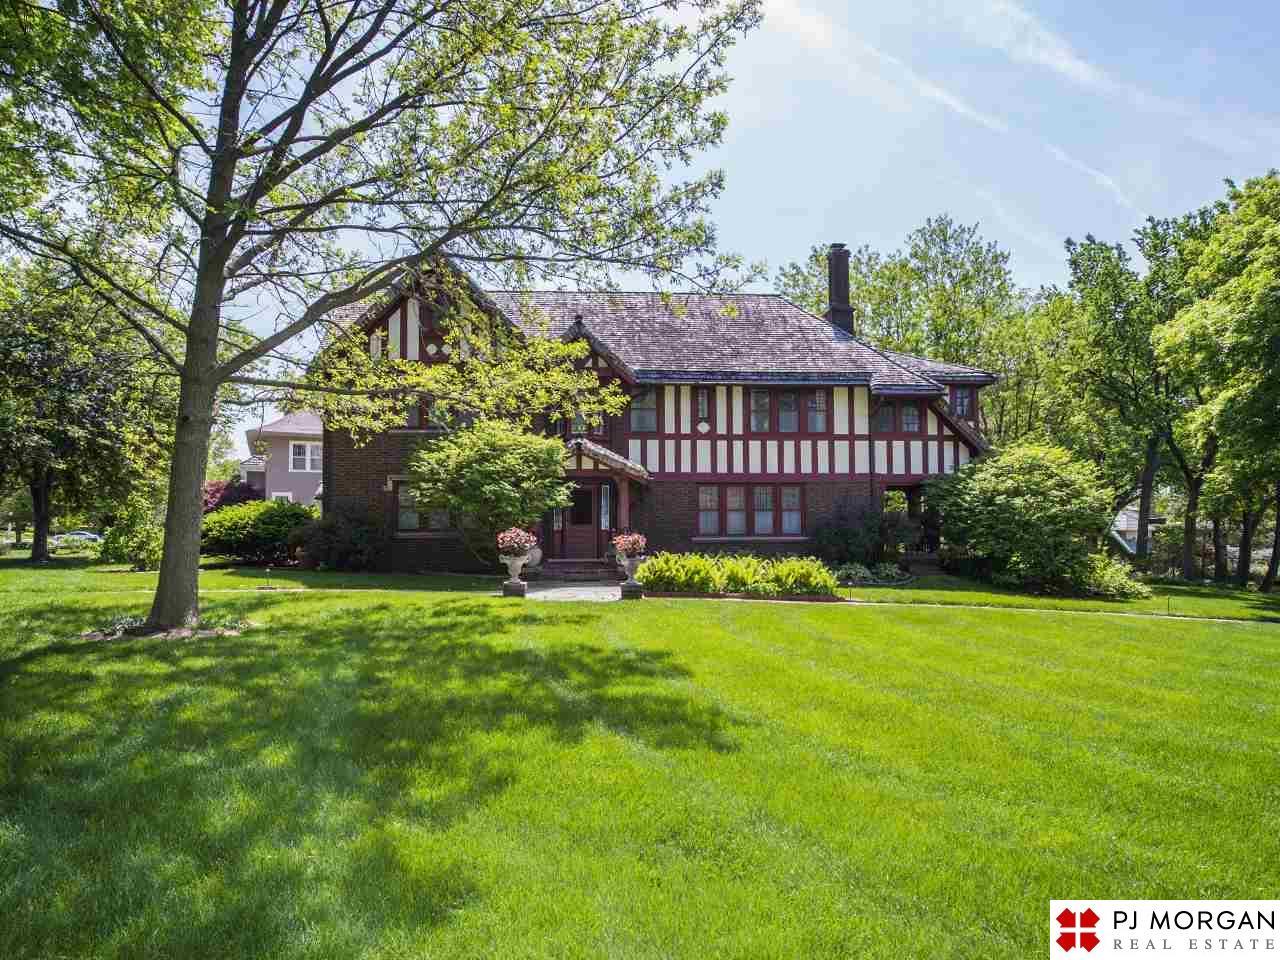 Ho home property management gosford - 110 N 54th Street